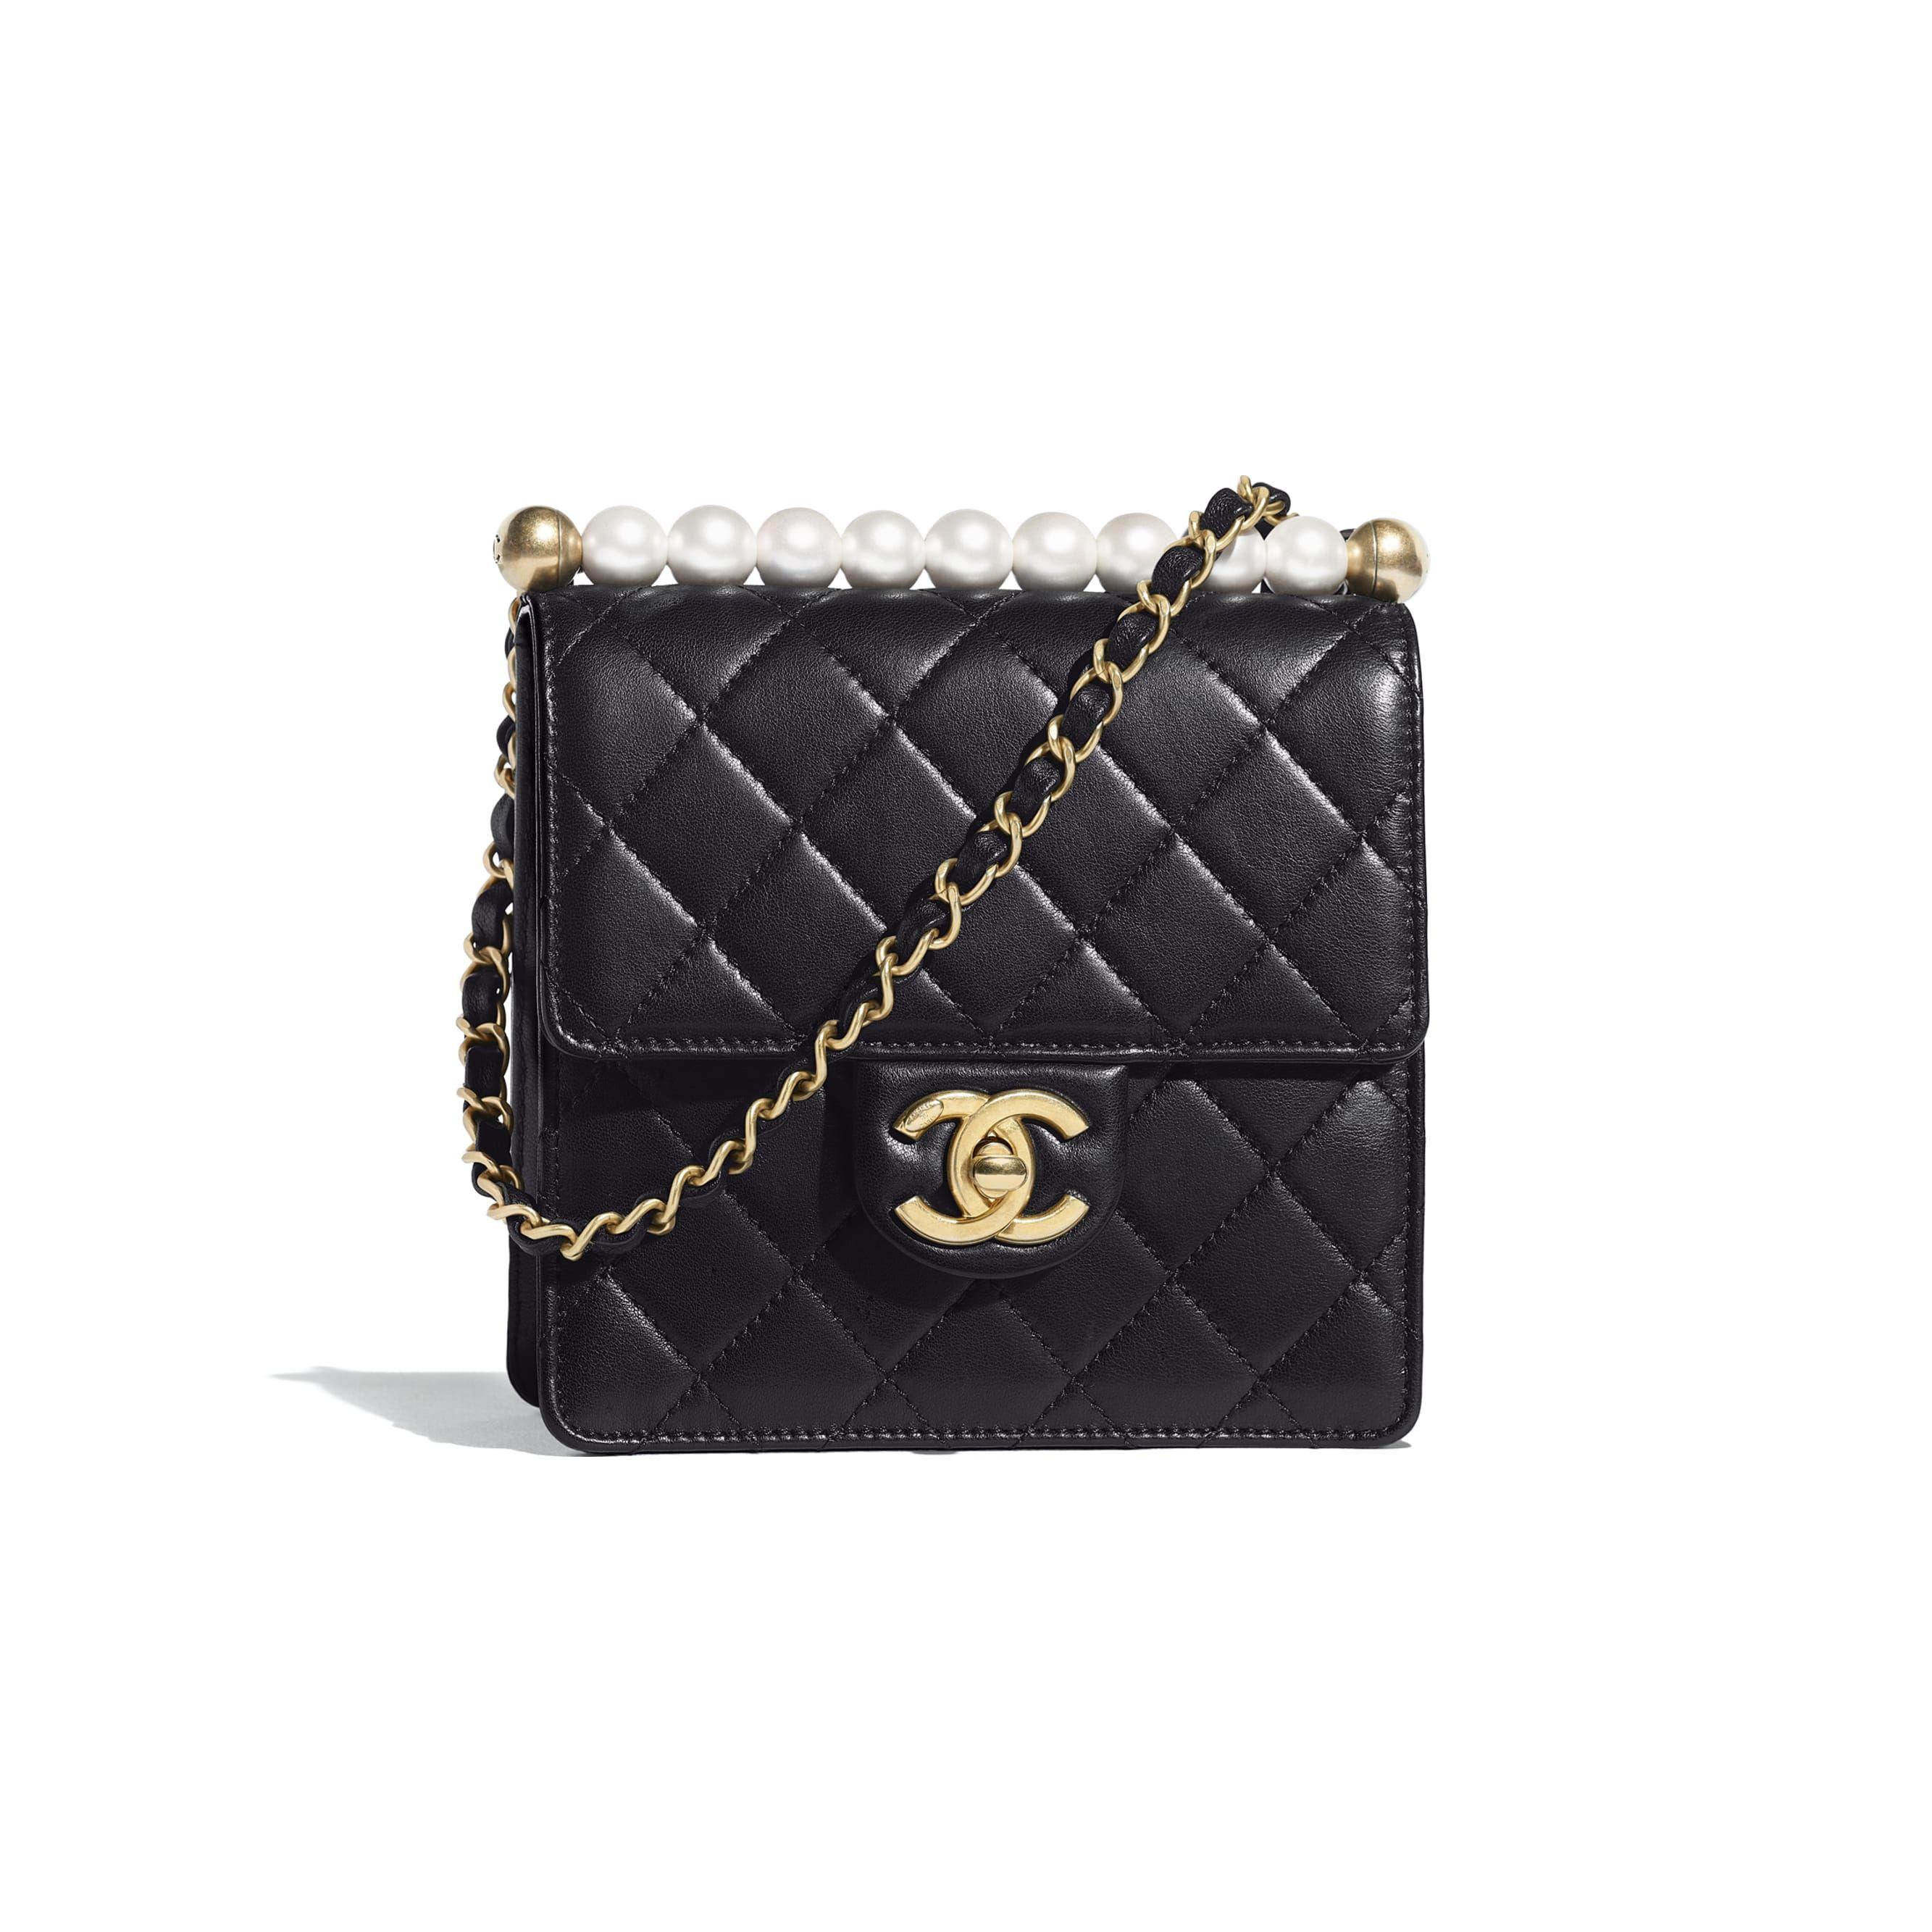 9d692243db07 Chanel - SS2019